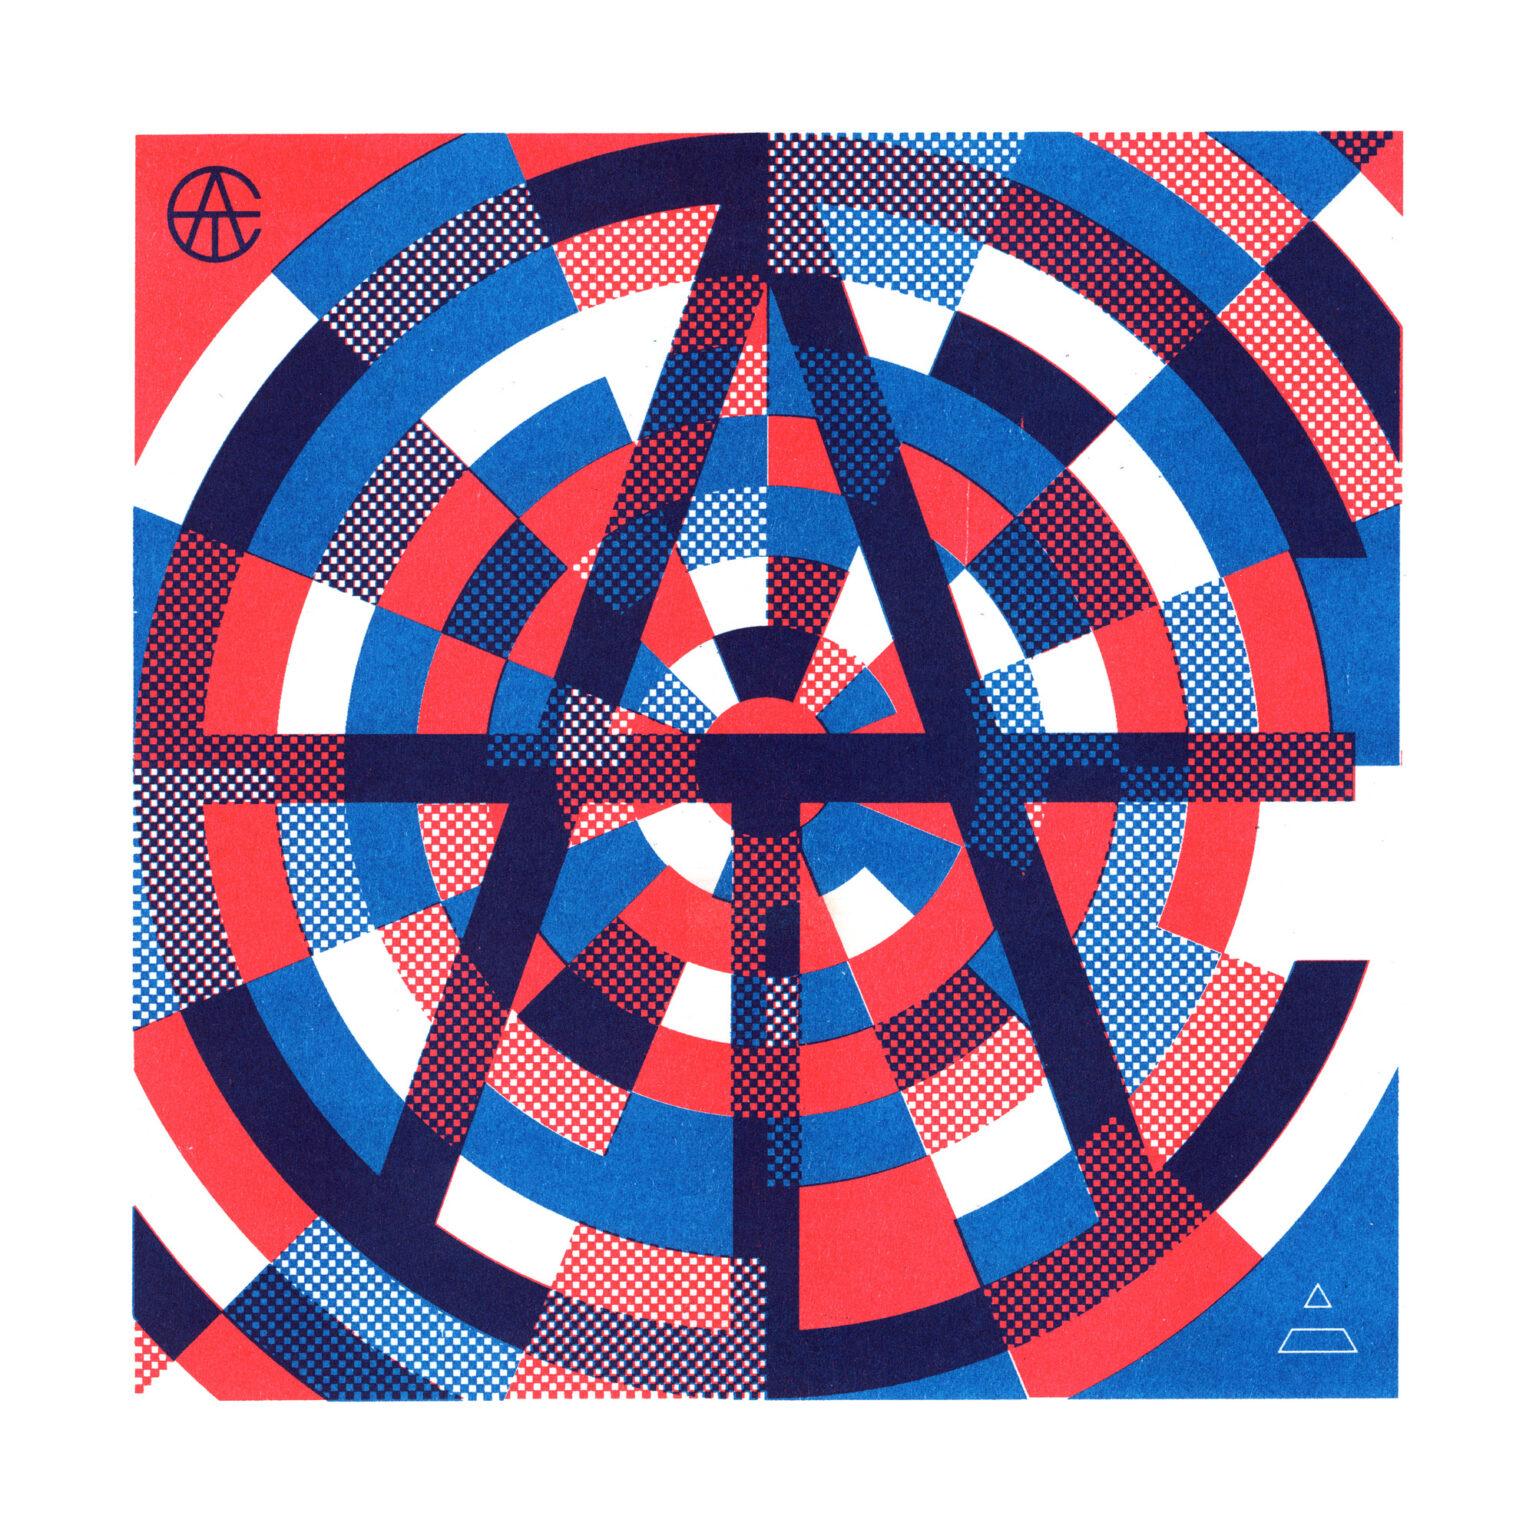 ATC Artist Series Dylan Wells Letter Logo